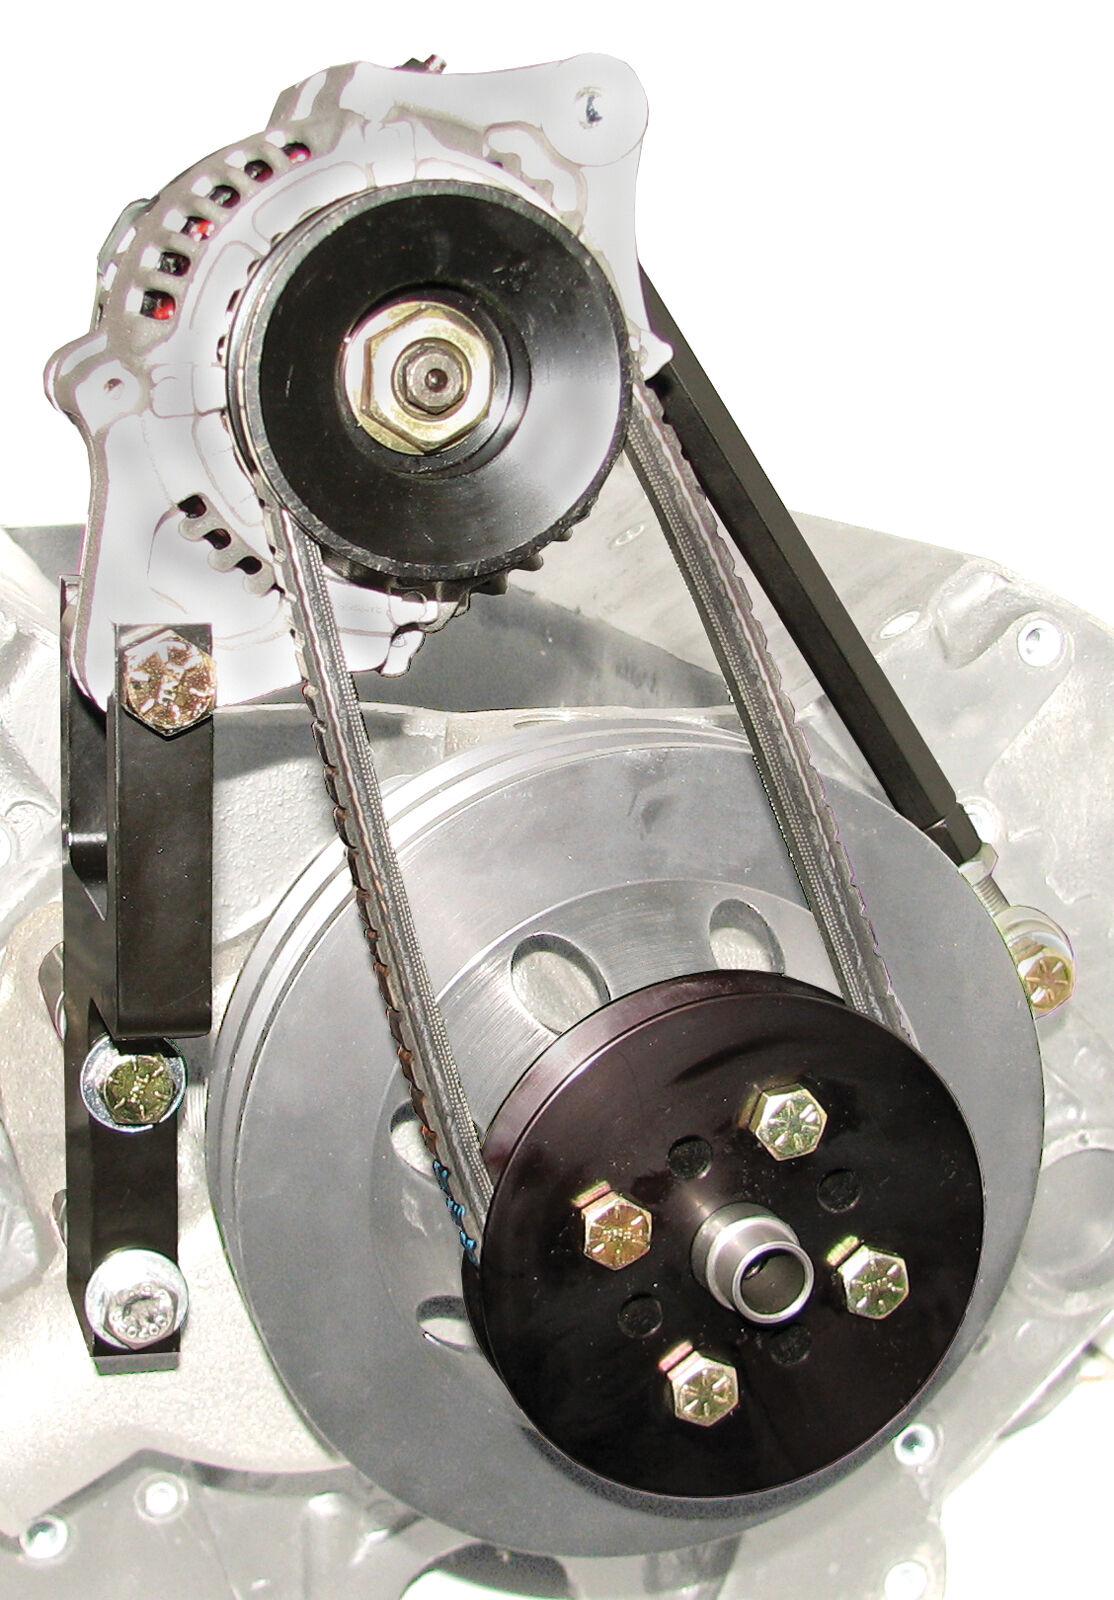 Chevy Turbo 400 Transmission Wiring Diagram Also 4l80e Transmission